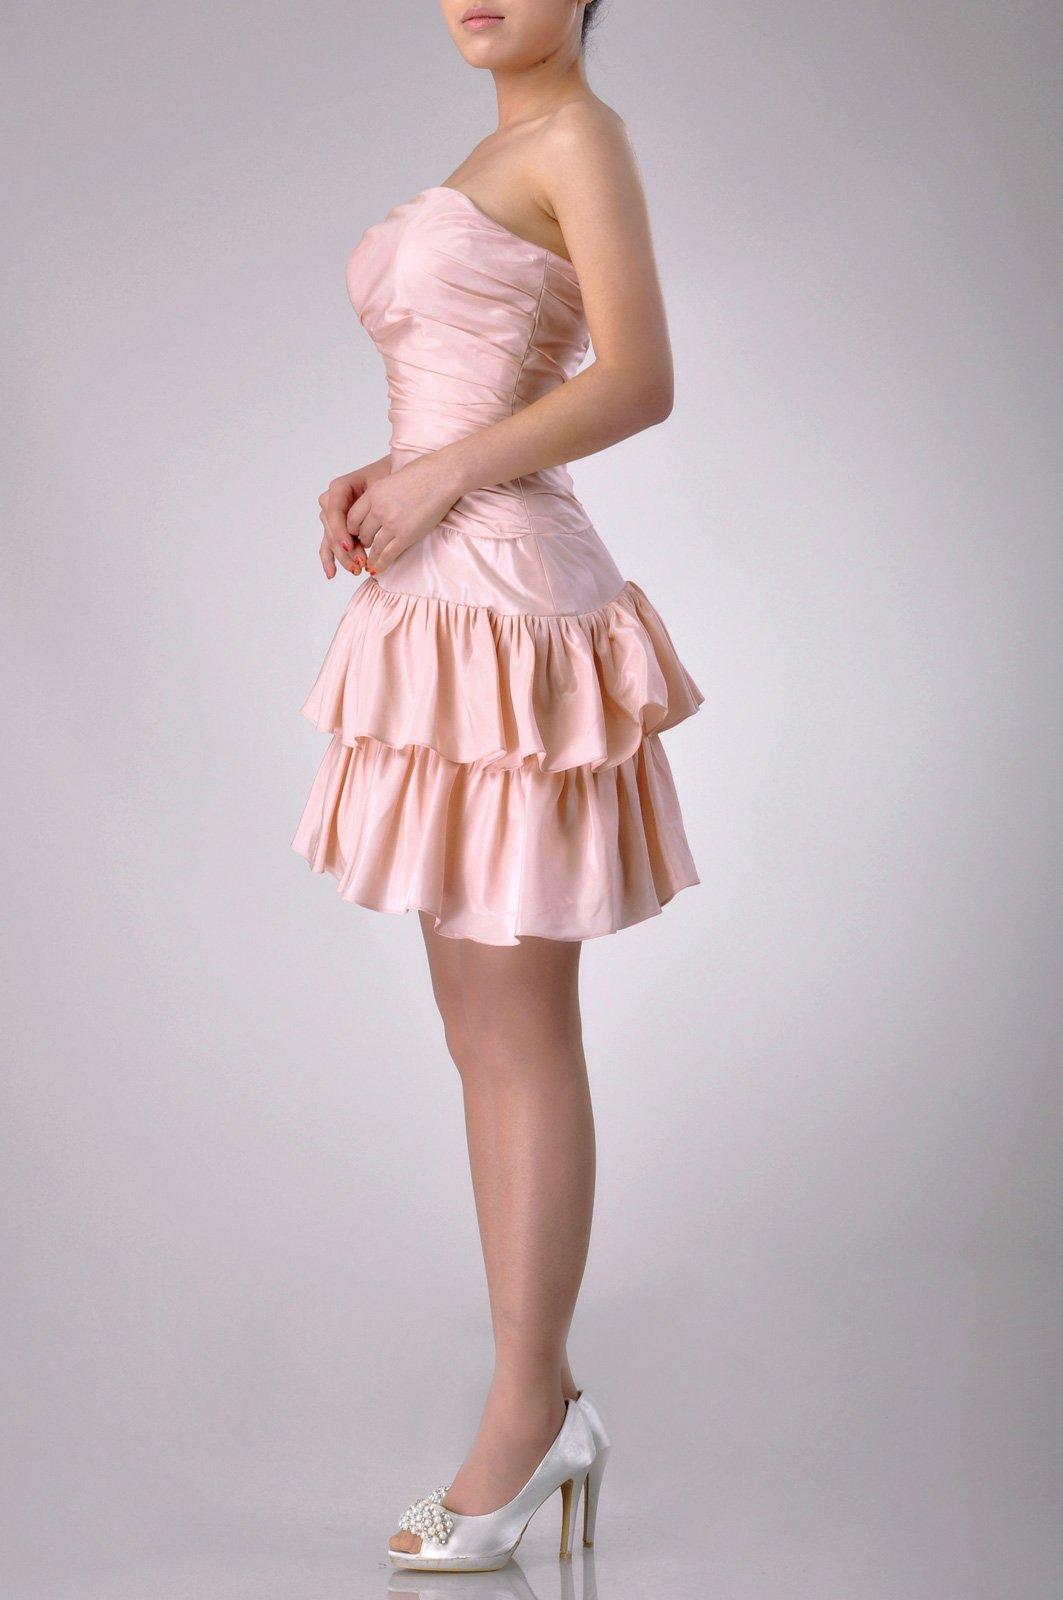 Taffeta Natrual Bateau Short Strapless Homecoming Modest Bridesmaid Dress Short, Color White,14 by Adorona (Image #4)